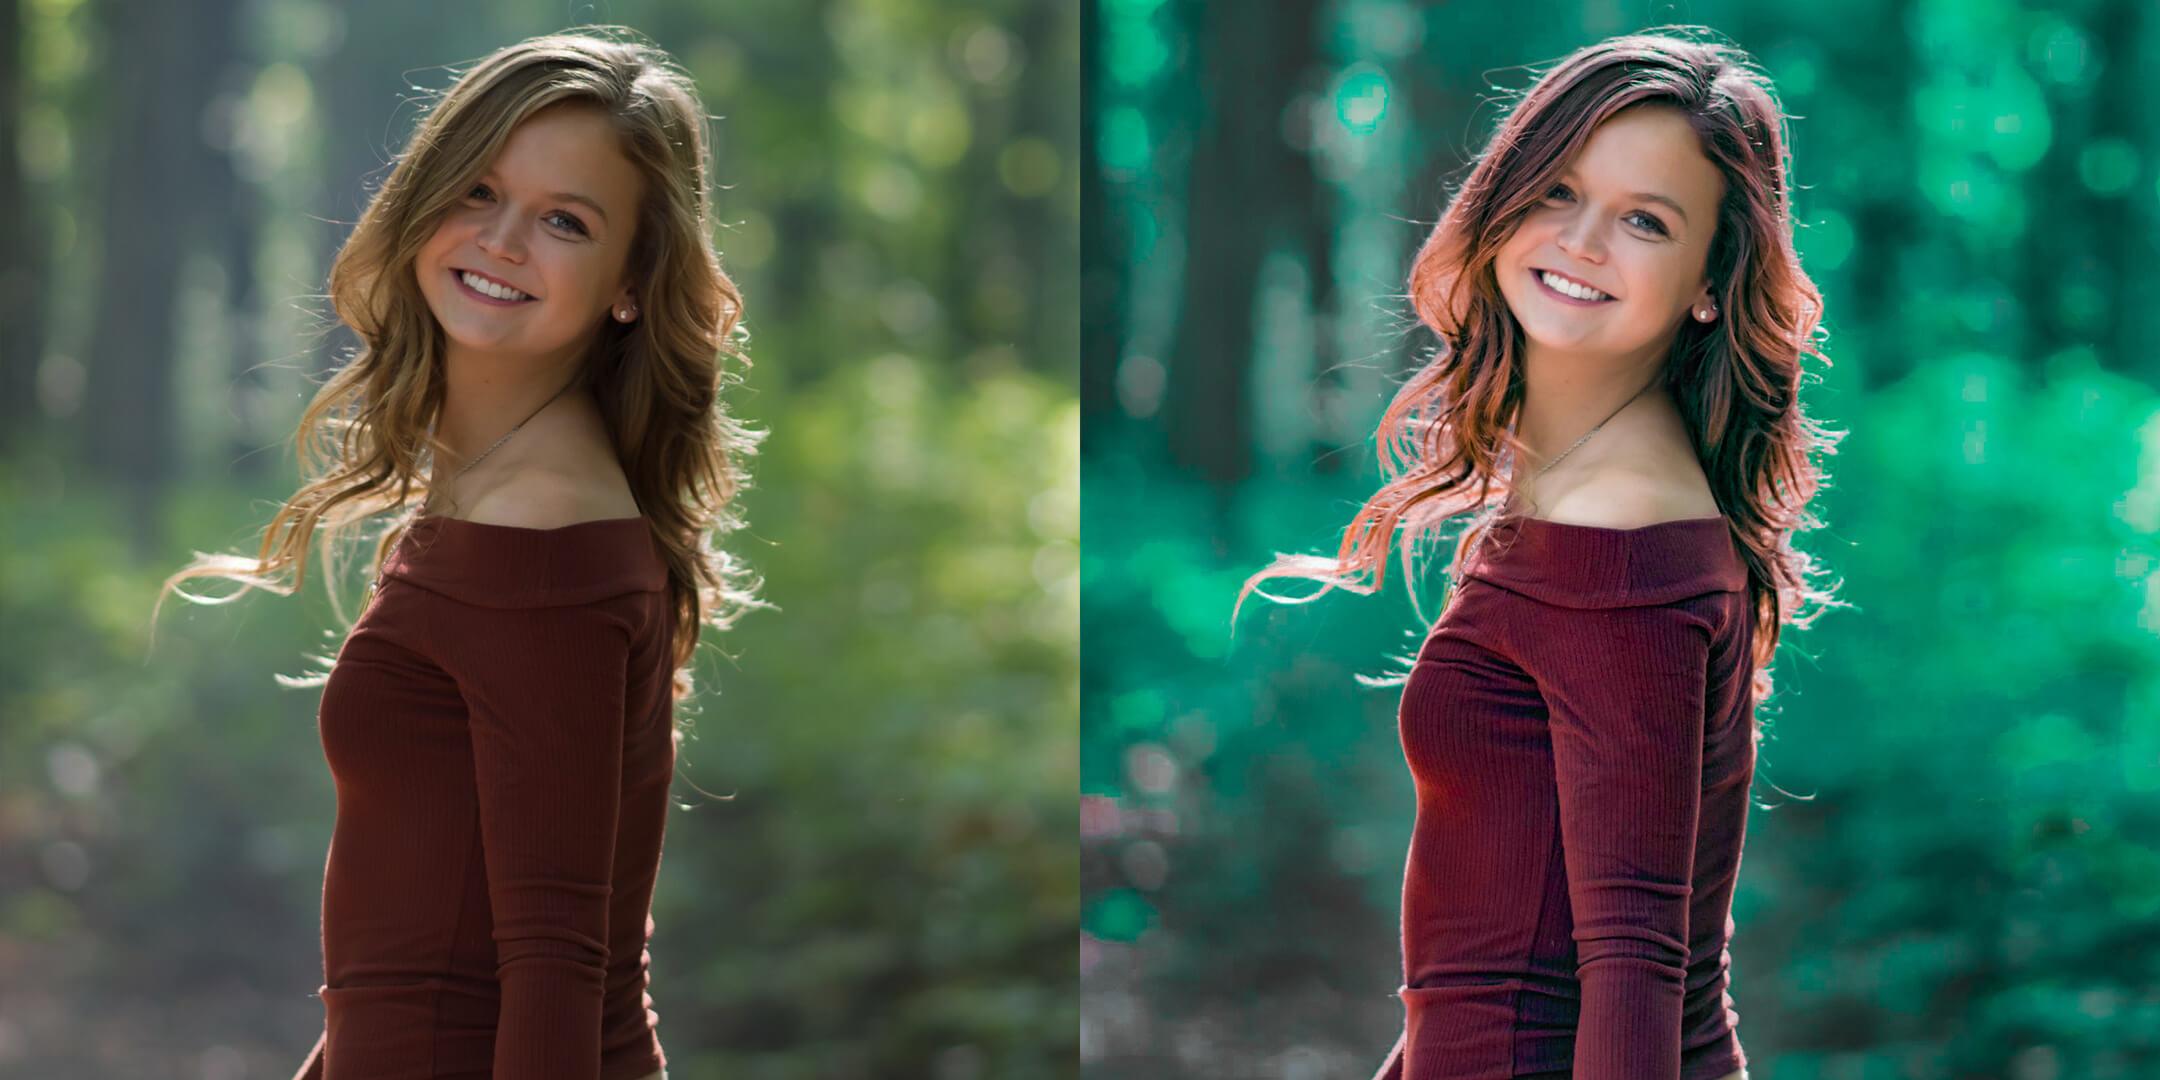 photo color correction services